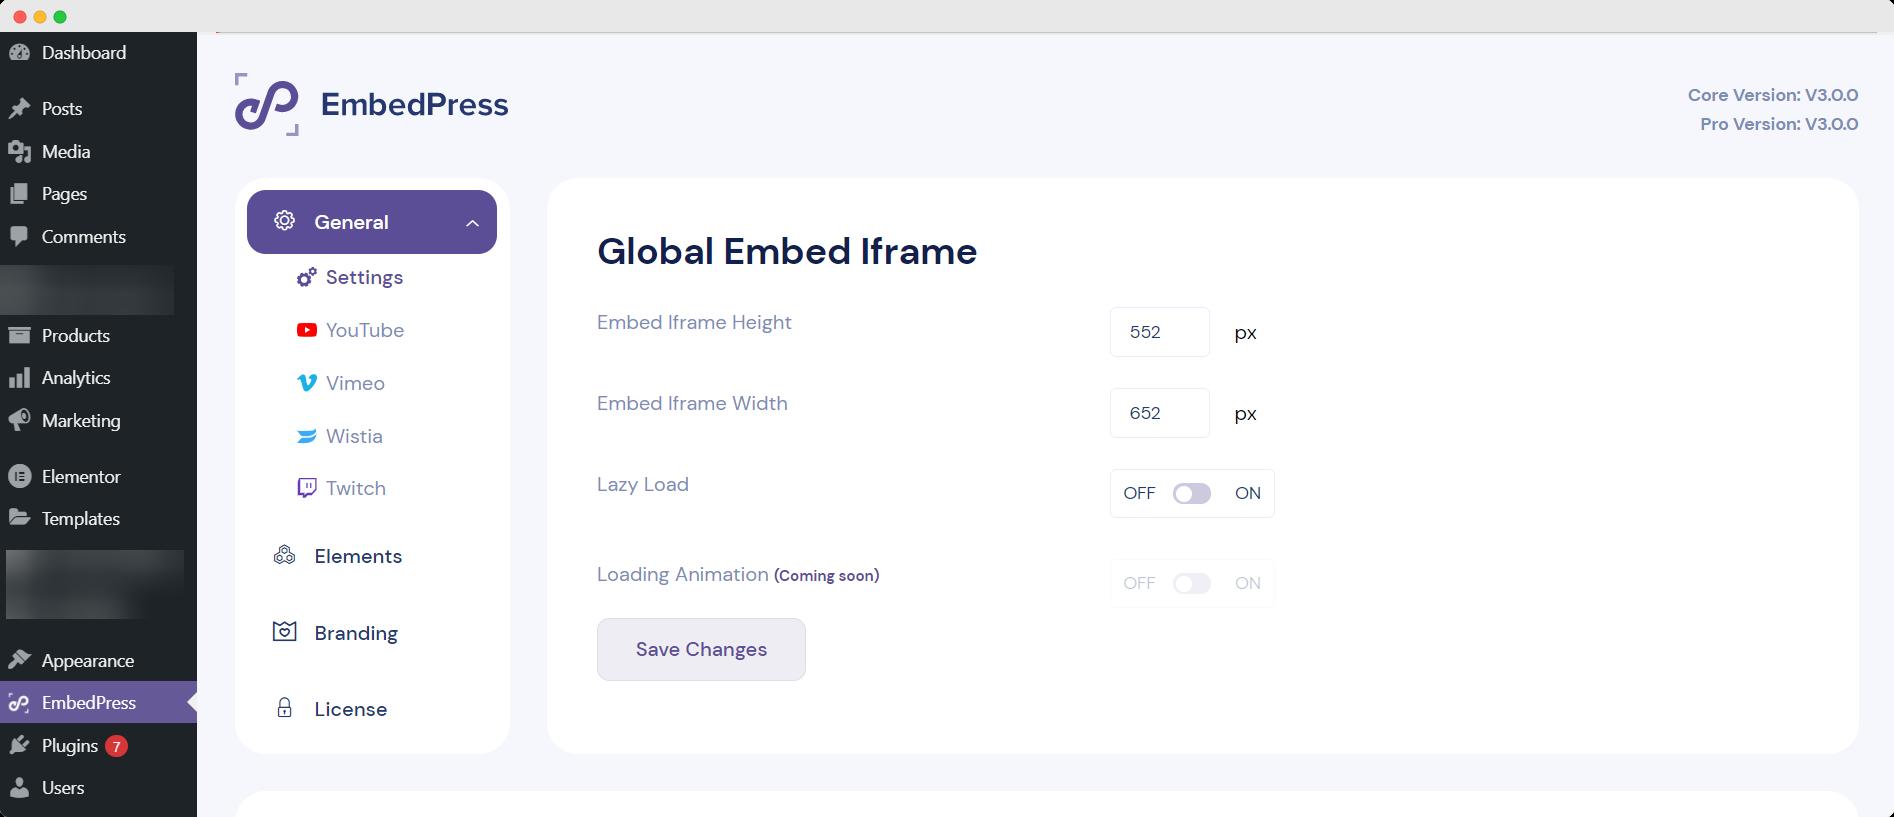 EmbedPress 3.0